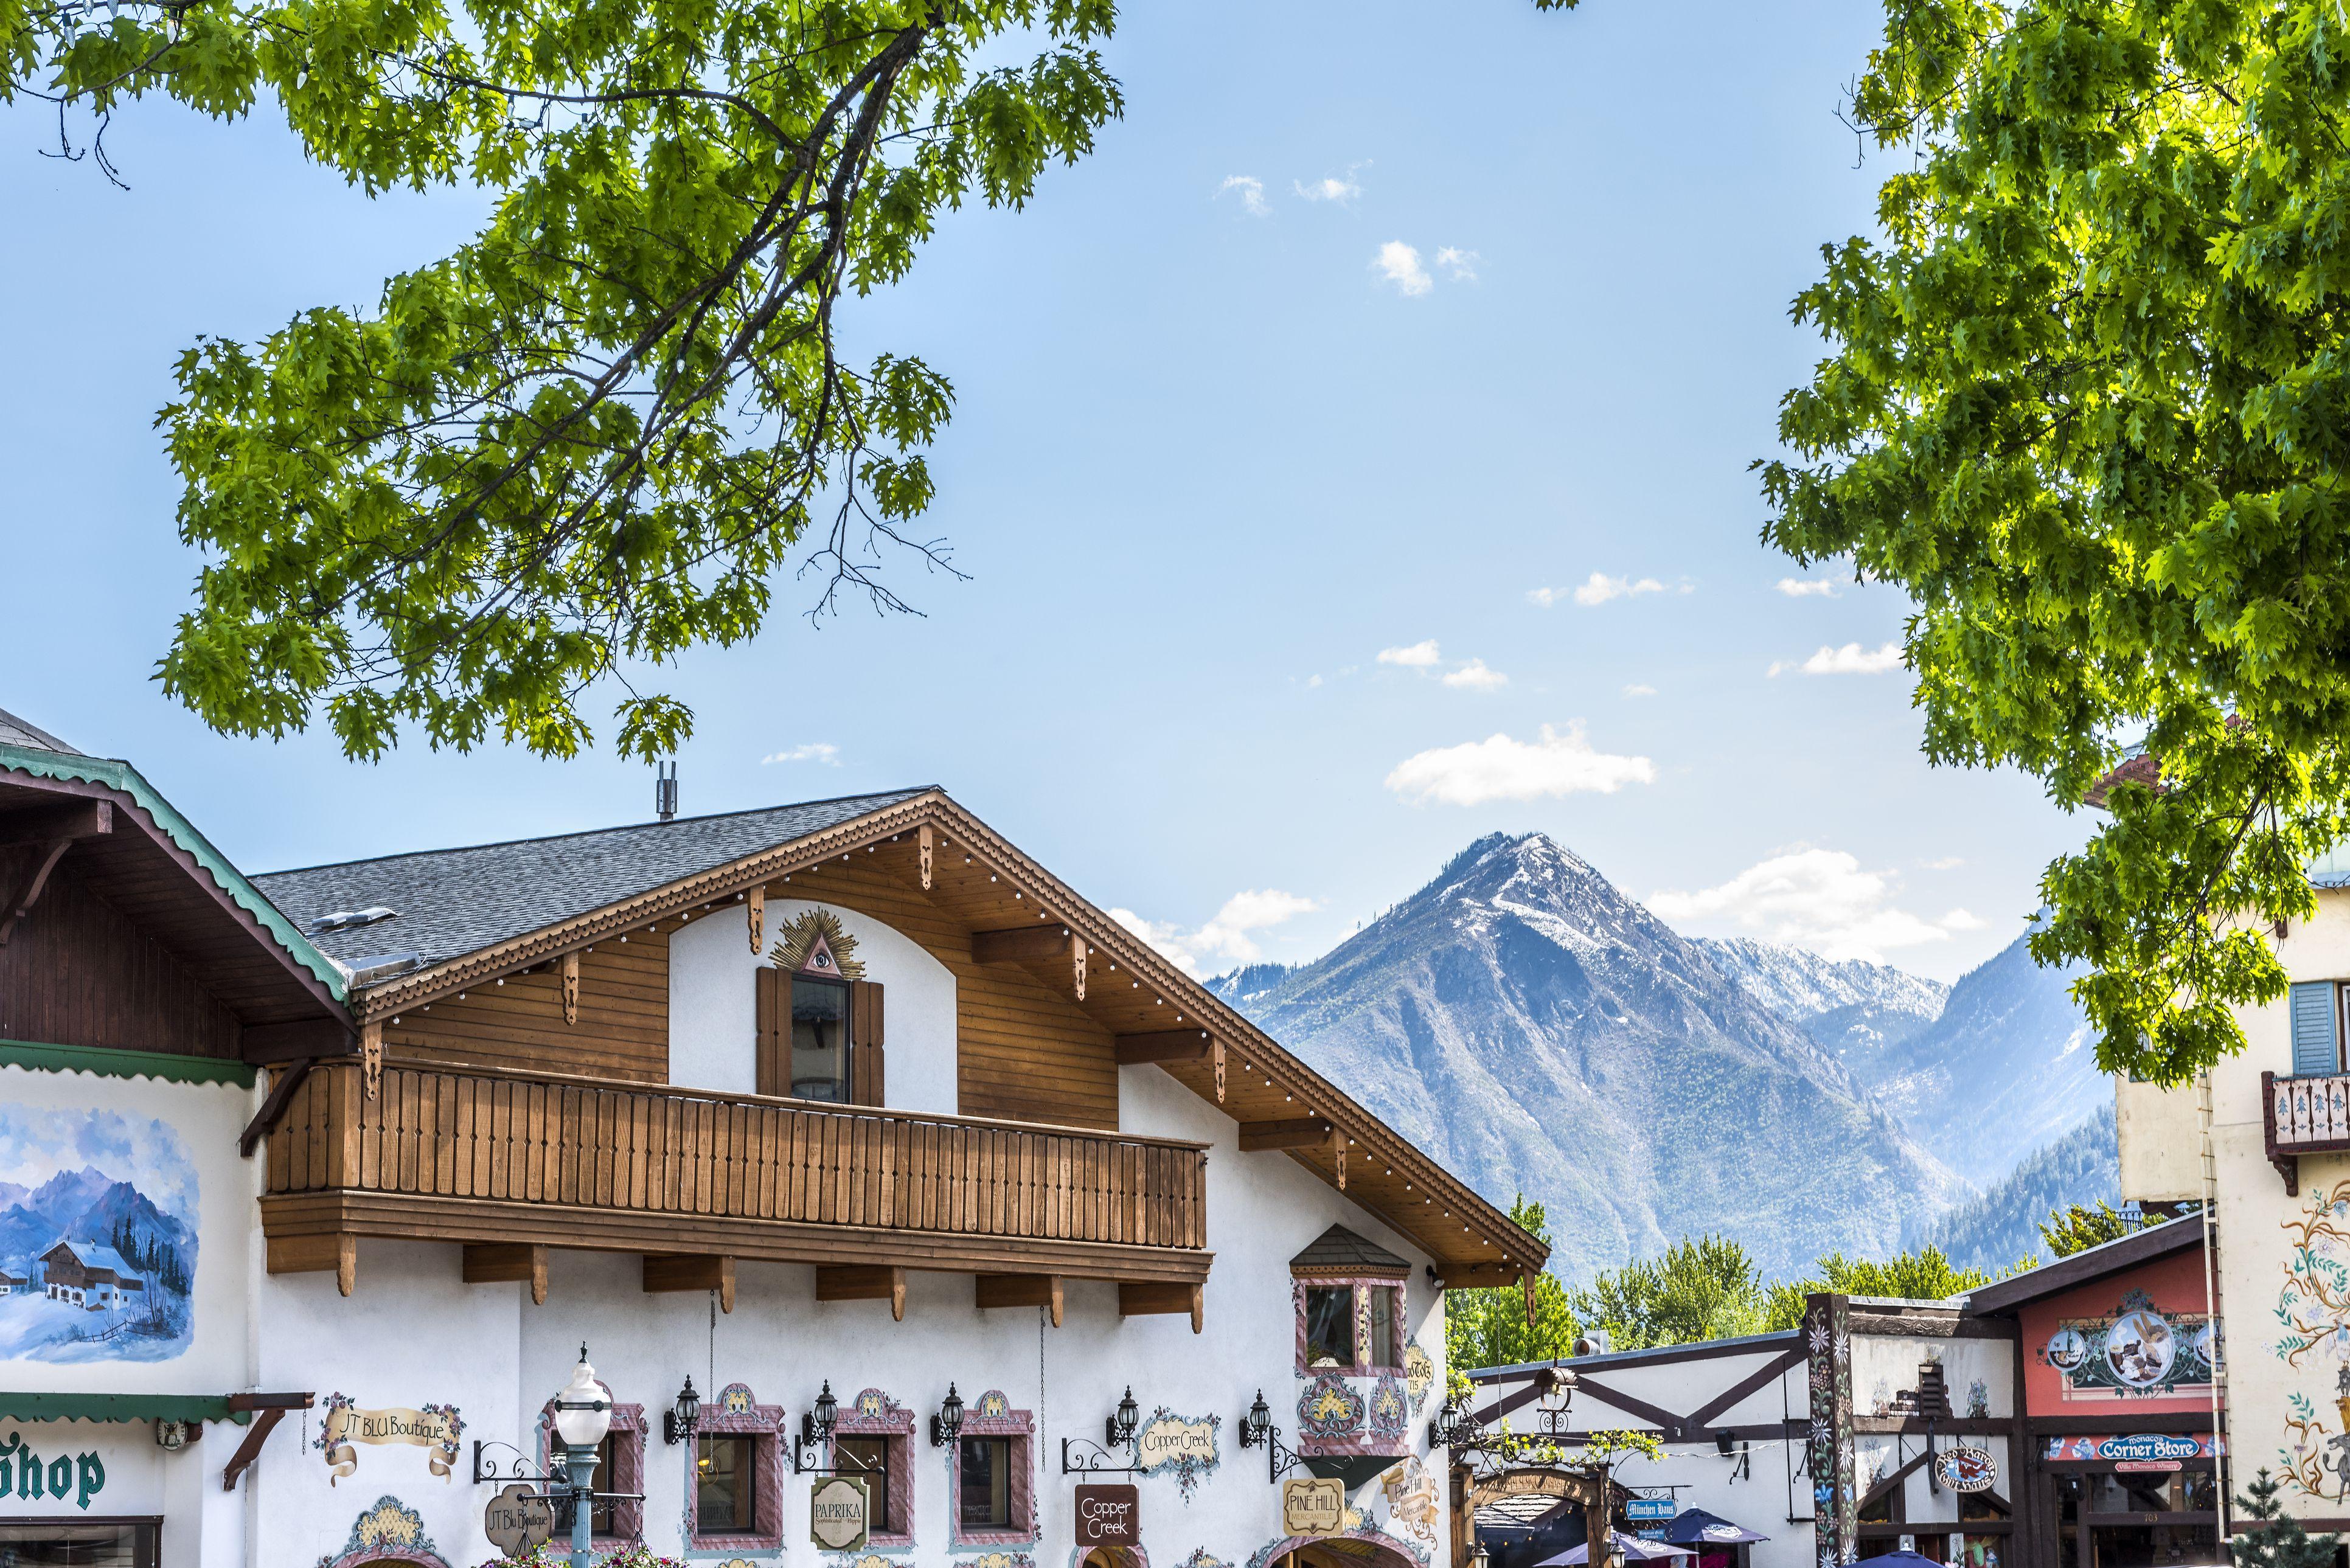 Rooftops of Bavarian Village in Washington